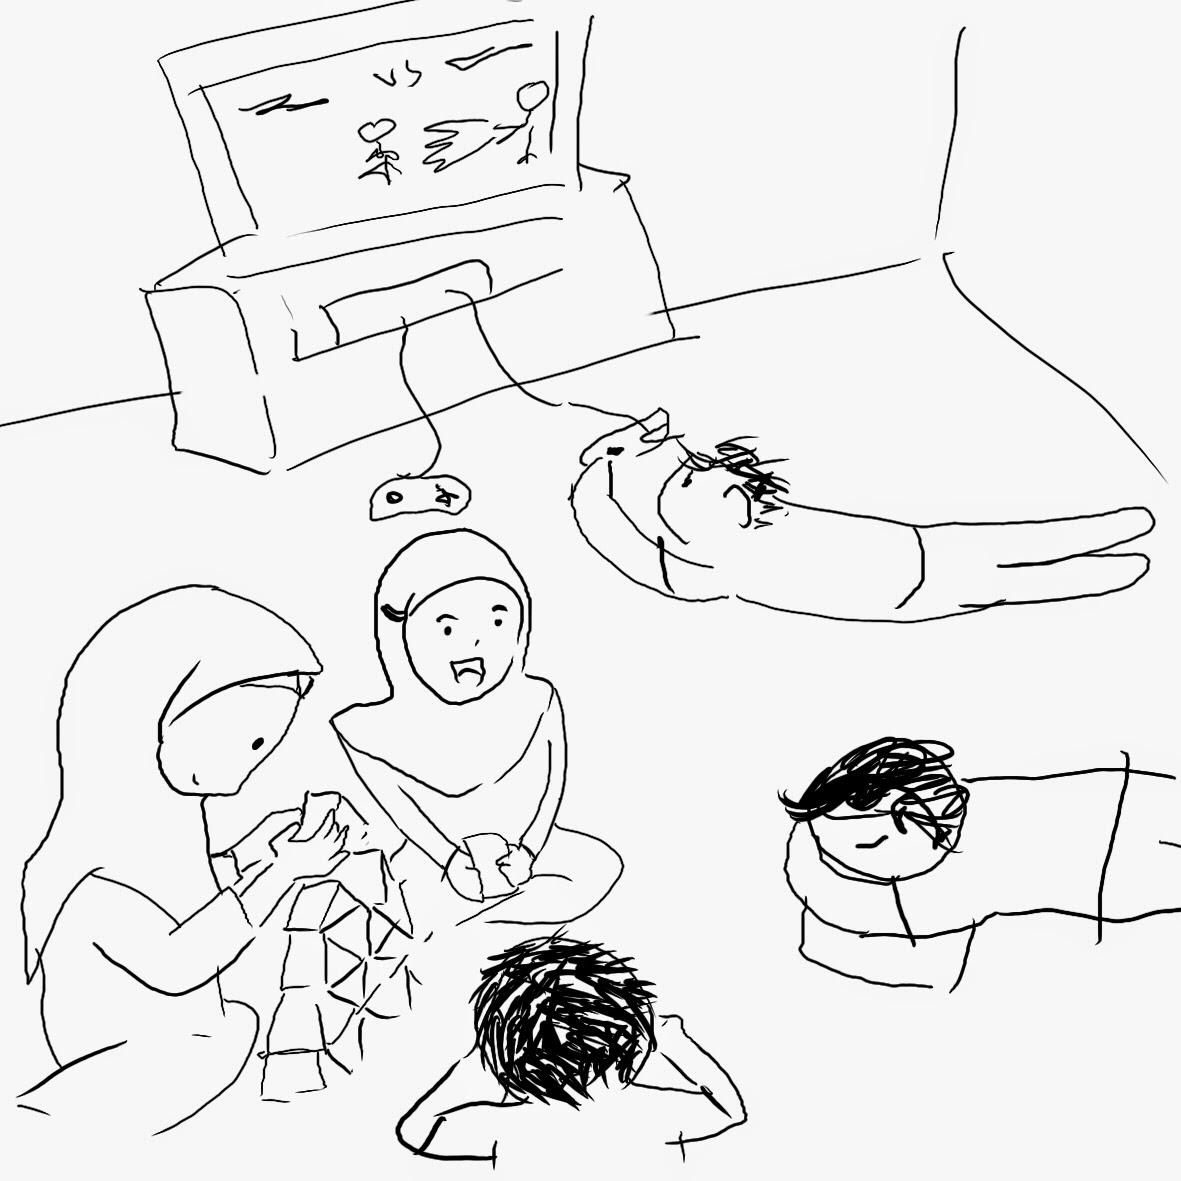 game , kartu, tiduran, kumpul keluarga